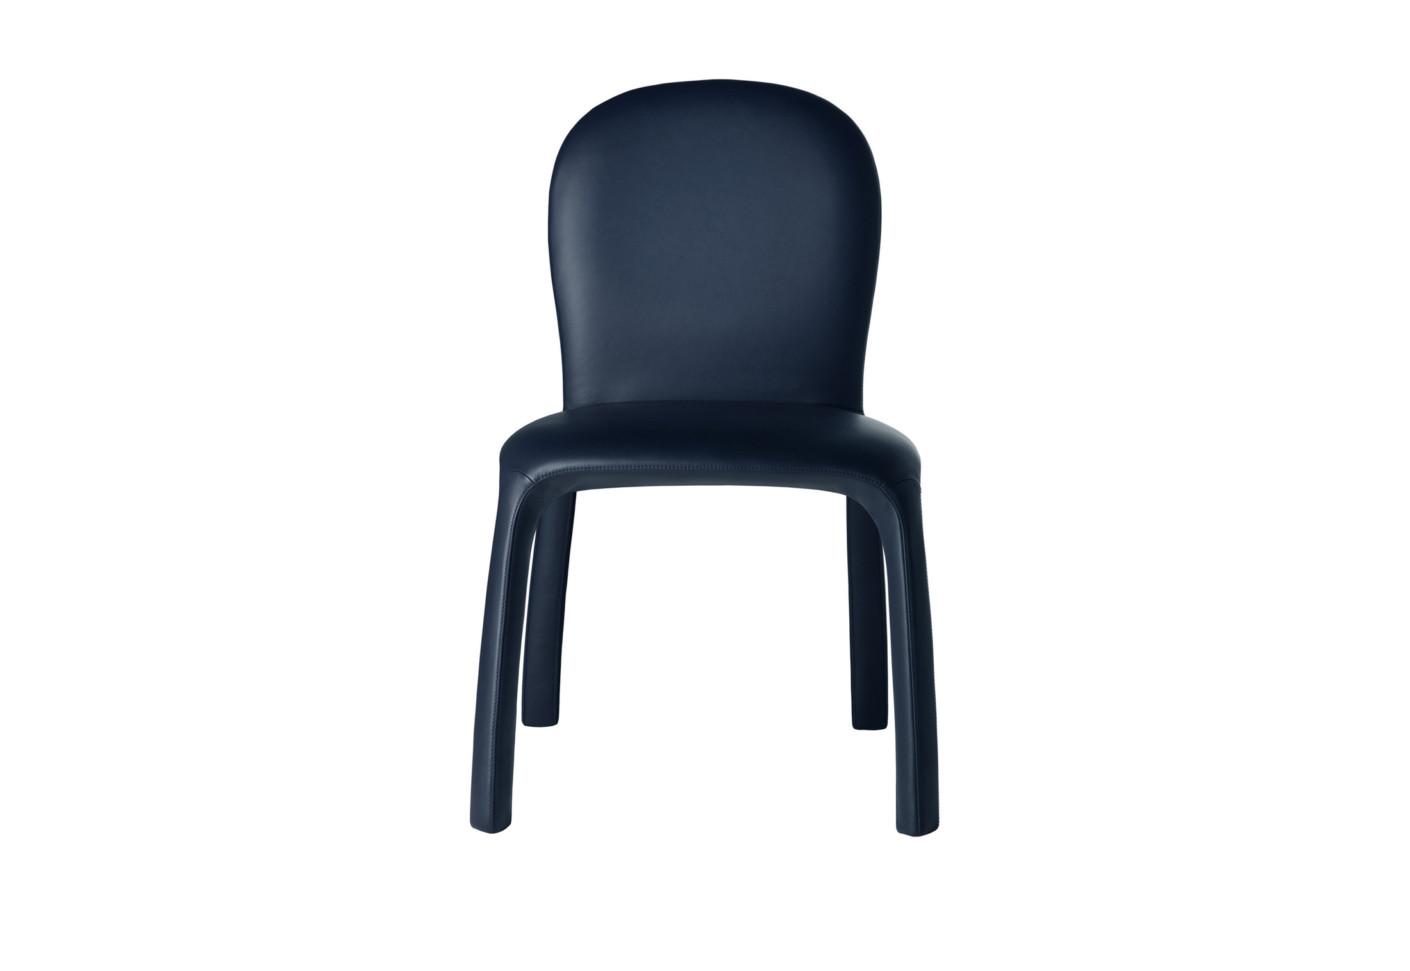 amelie stuhl von poltrona frau stylepark. Black Bedroom Furniture Sets. Home Design Ideas